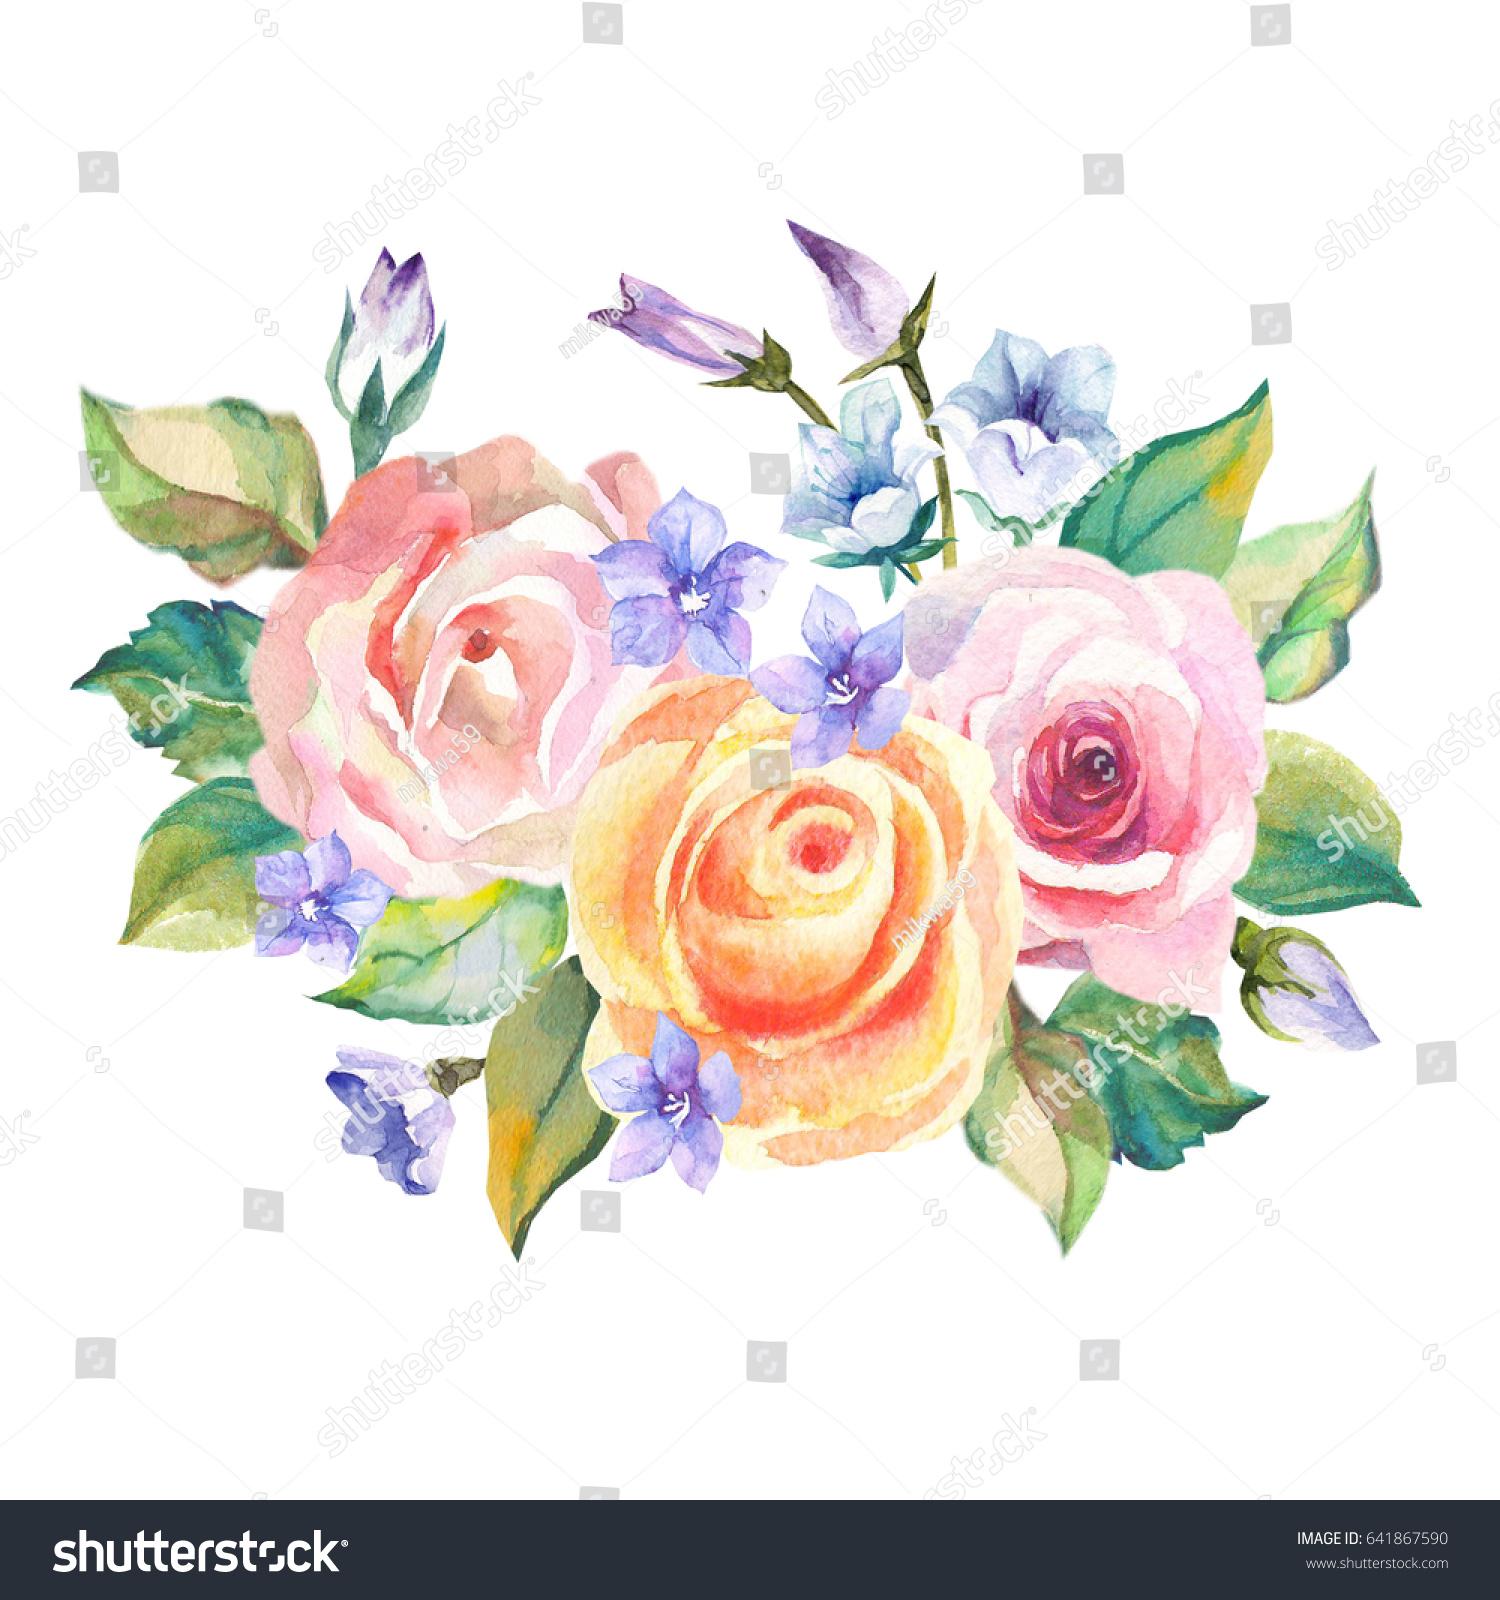 Cute bouquet roses blue flowers stock illustration 641867590 cute bouquet of roses and blue flowers izmirmasajfo